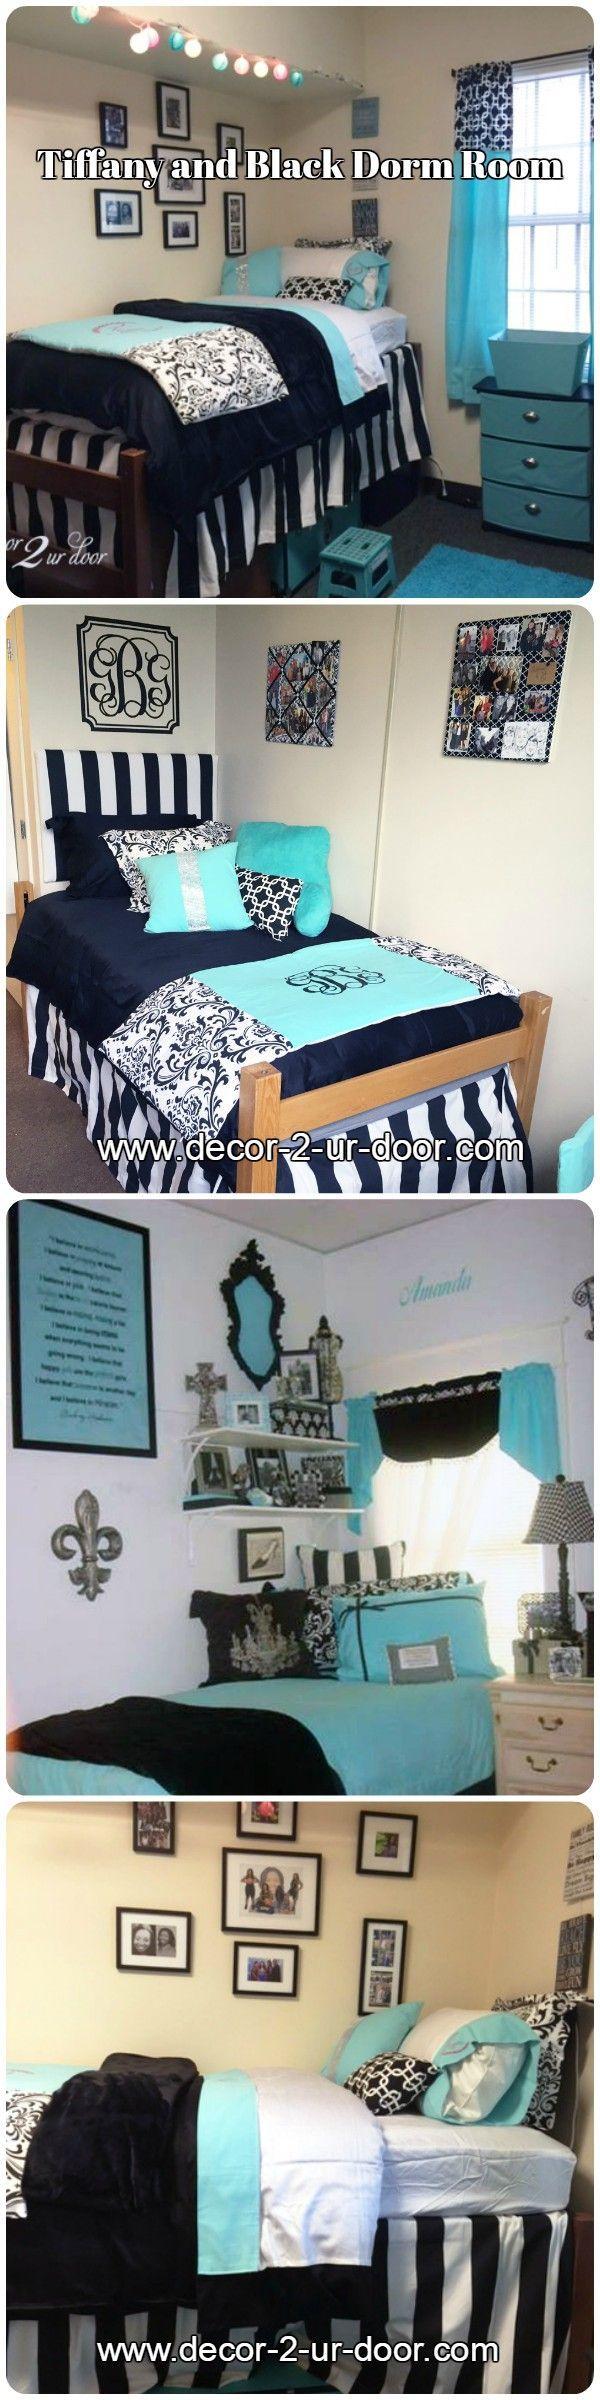 40 best tiffany blue teen bedroom images on pinterest | teen